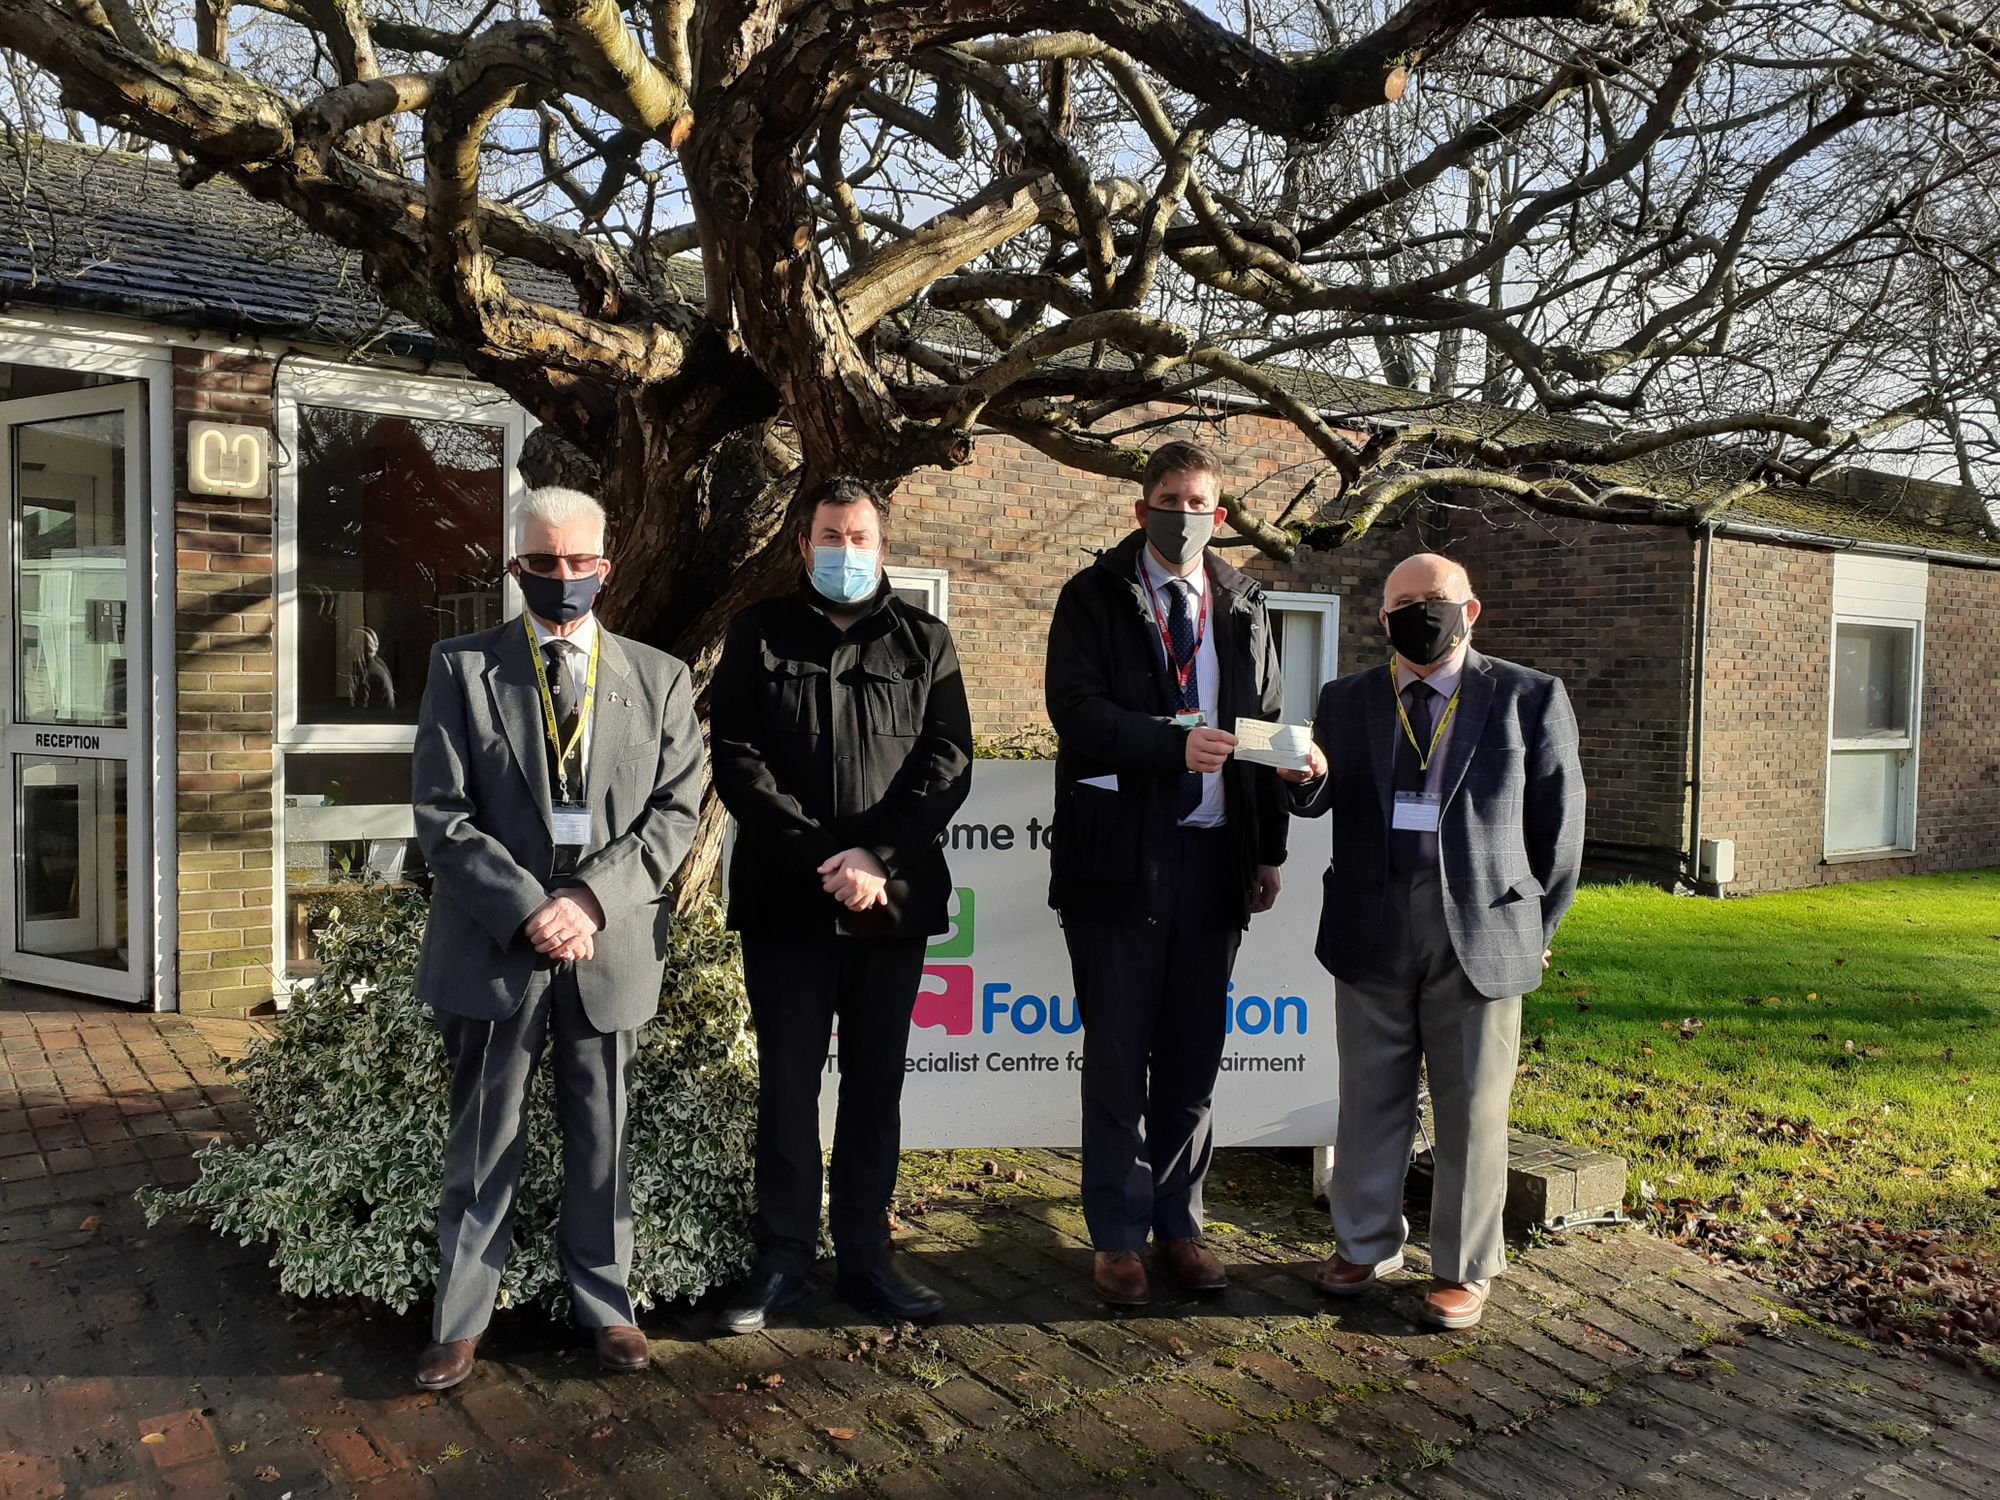 England - Budleigh Salterton Freemasons donate £900 to three Devon charities